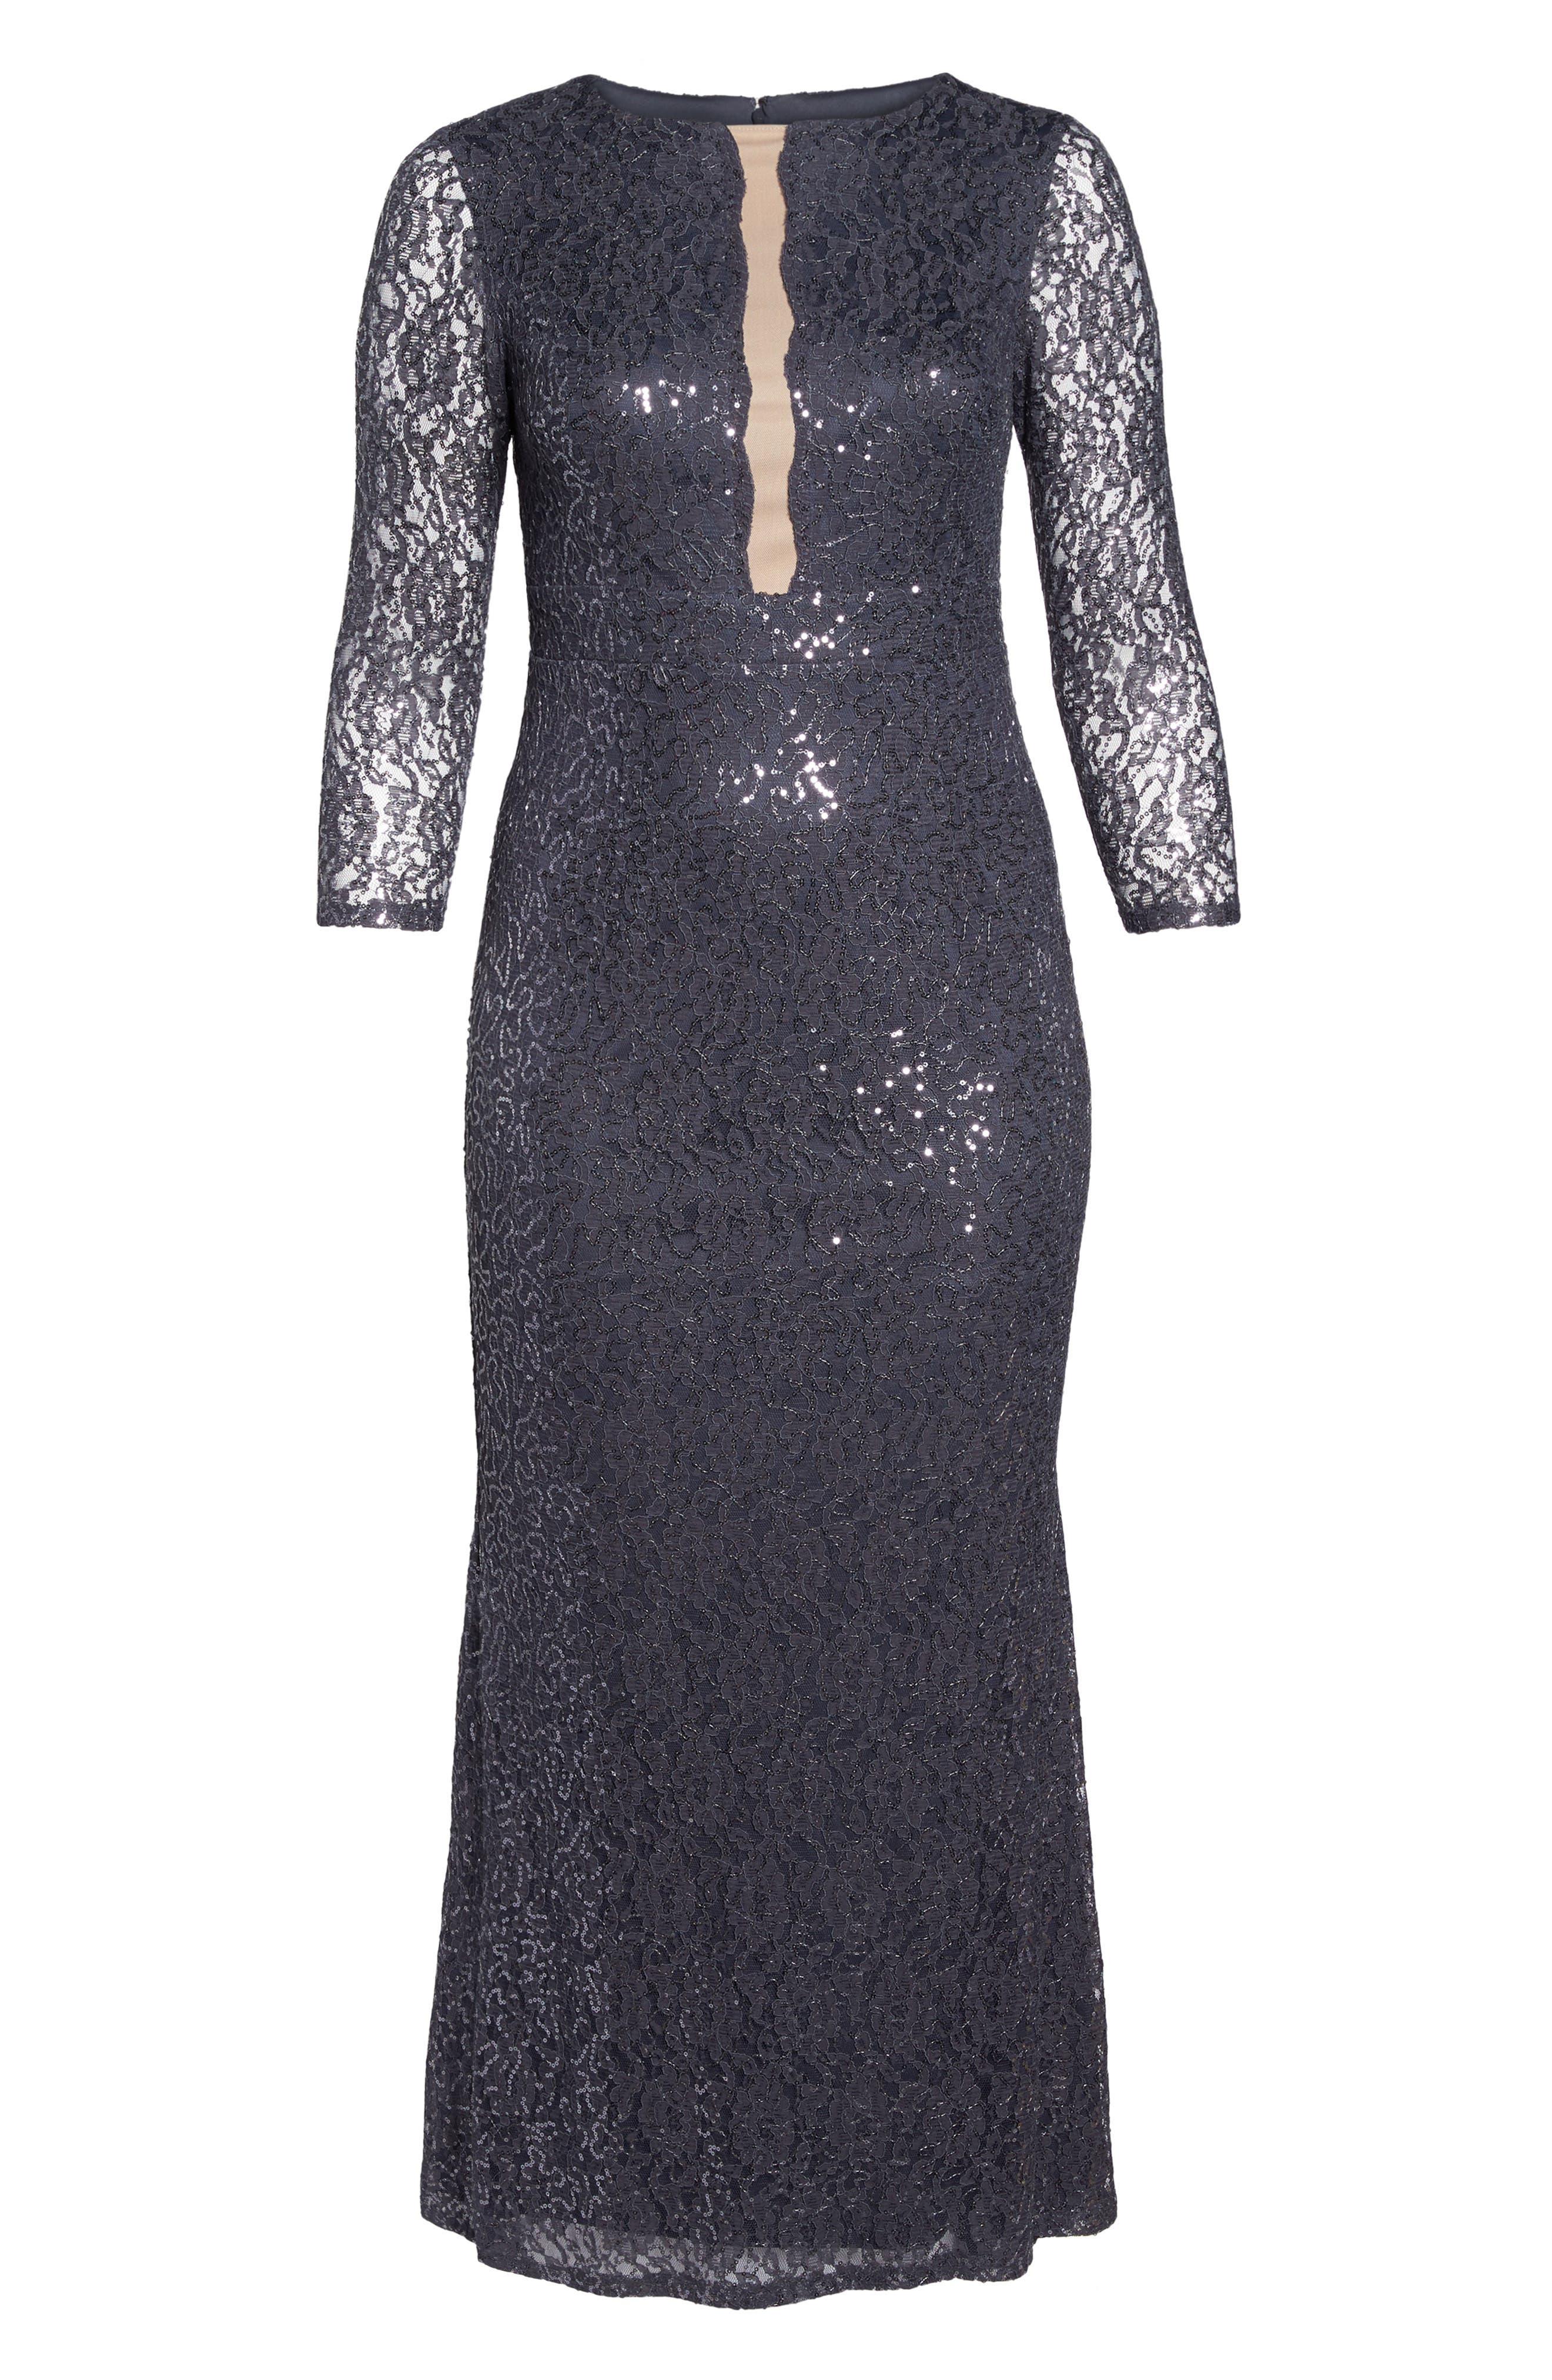 MARINA, Sequin Lace A-Line Gown, Alternate thumbnail 6, color, 069